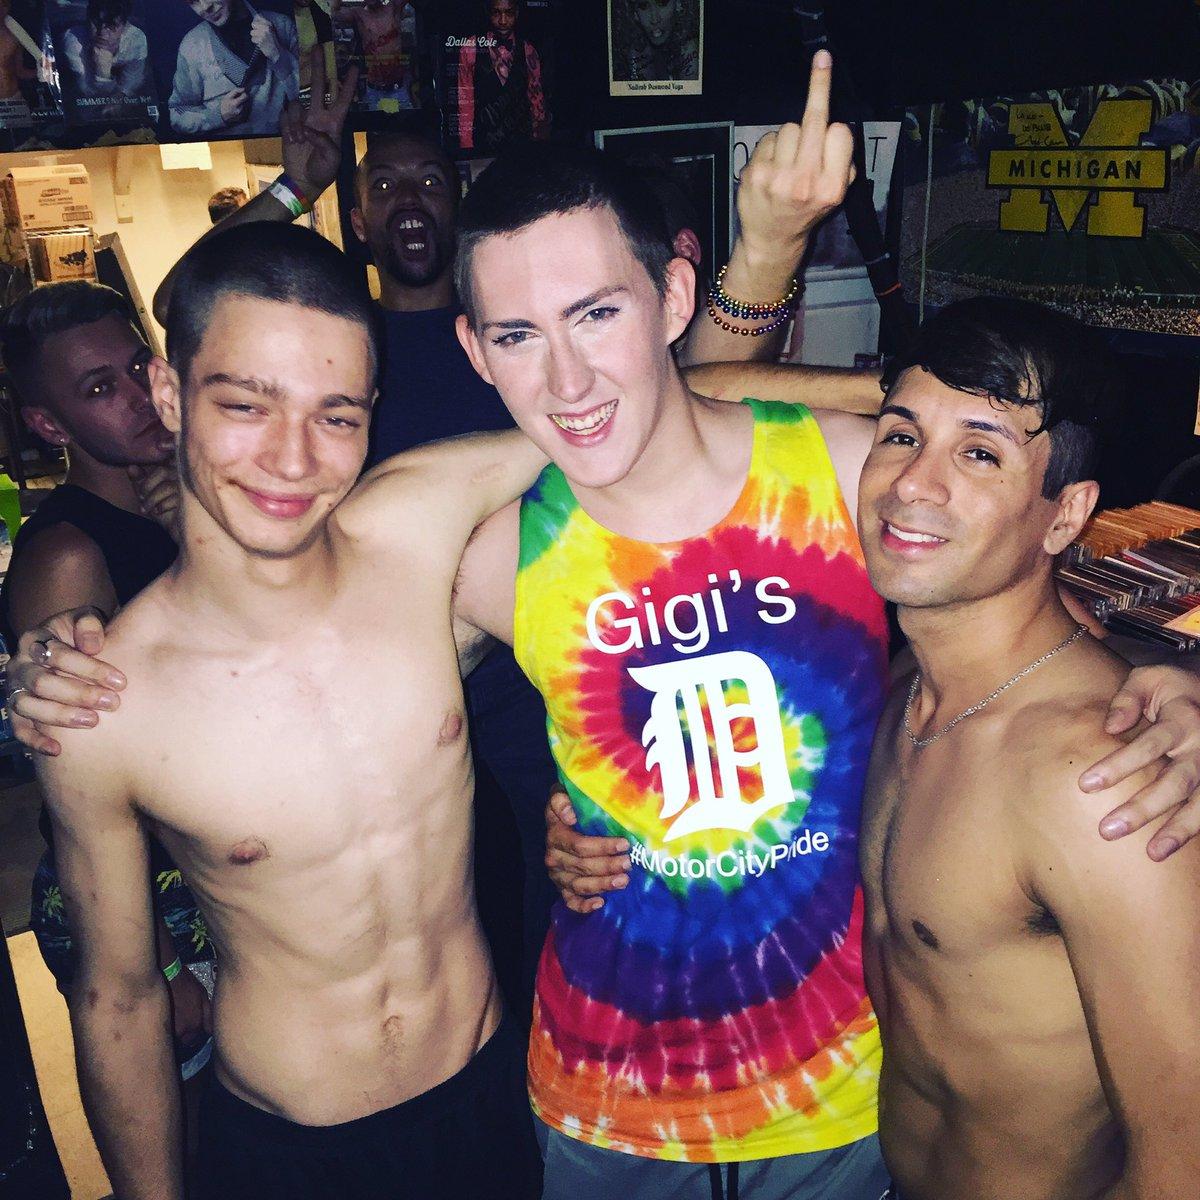 Detroit gay bars